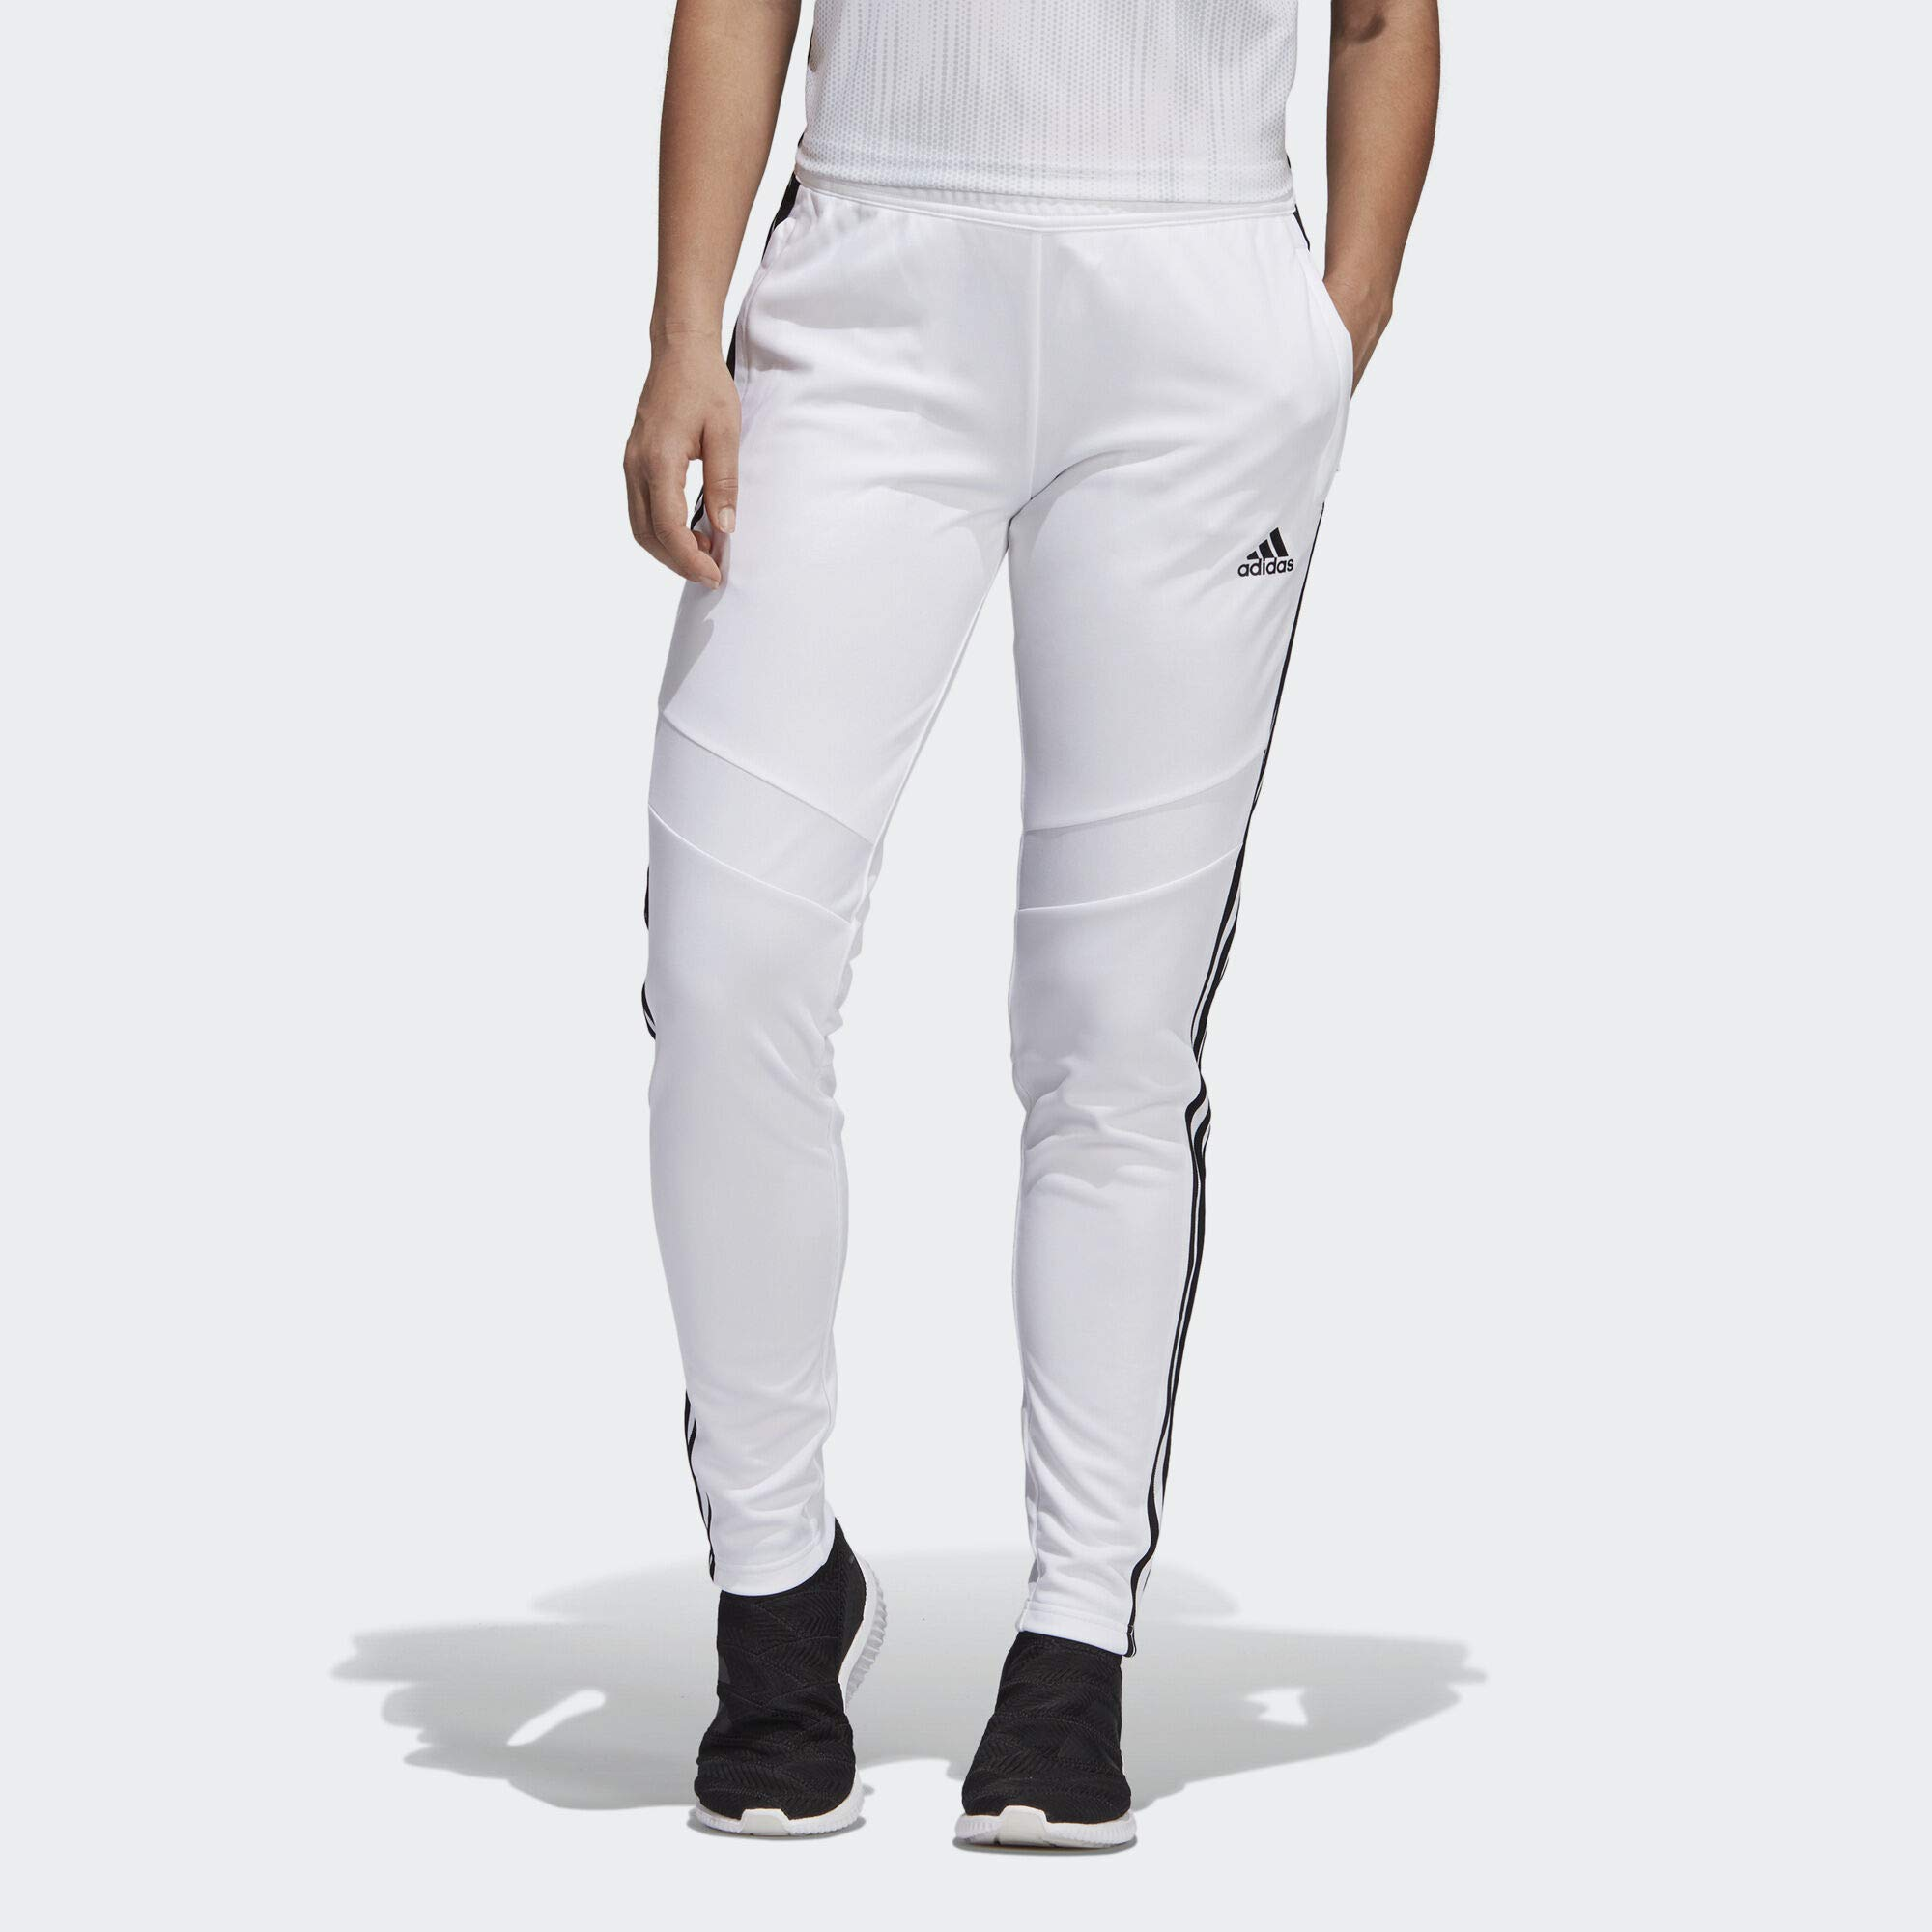 adidas Women's Tiro19 Training Pants, White/Black, XX-Large by adidas